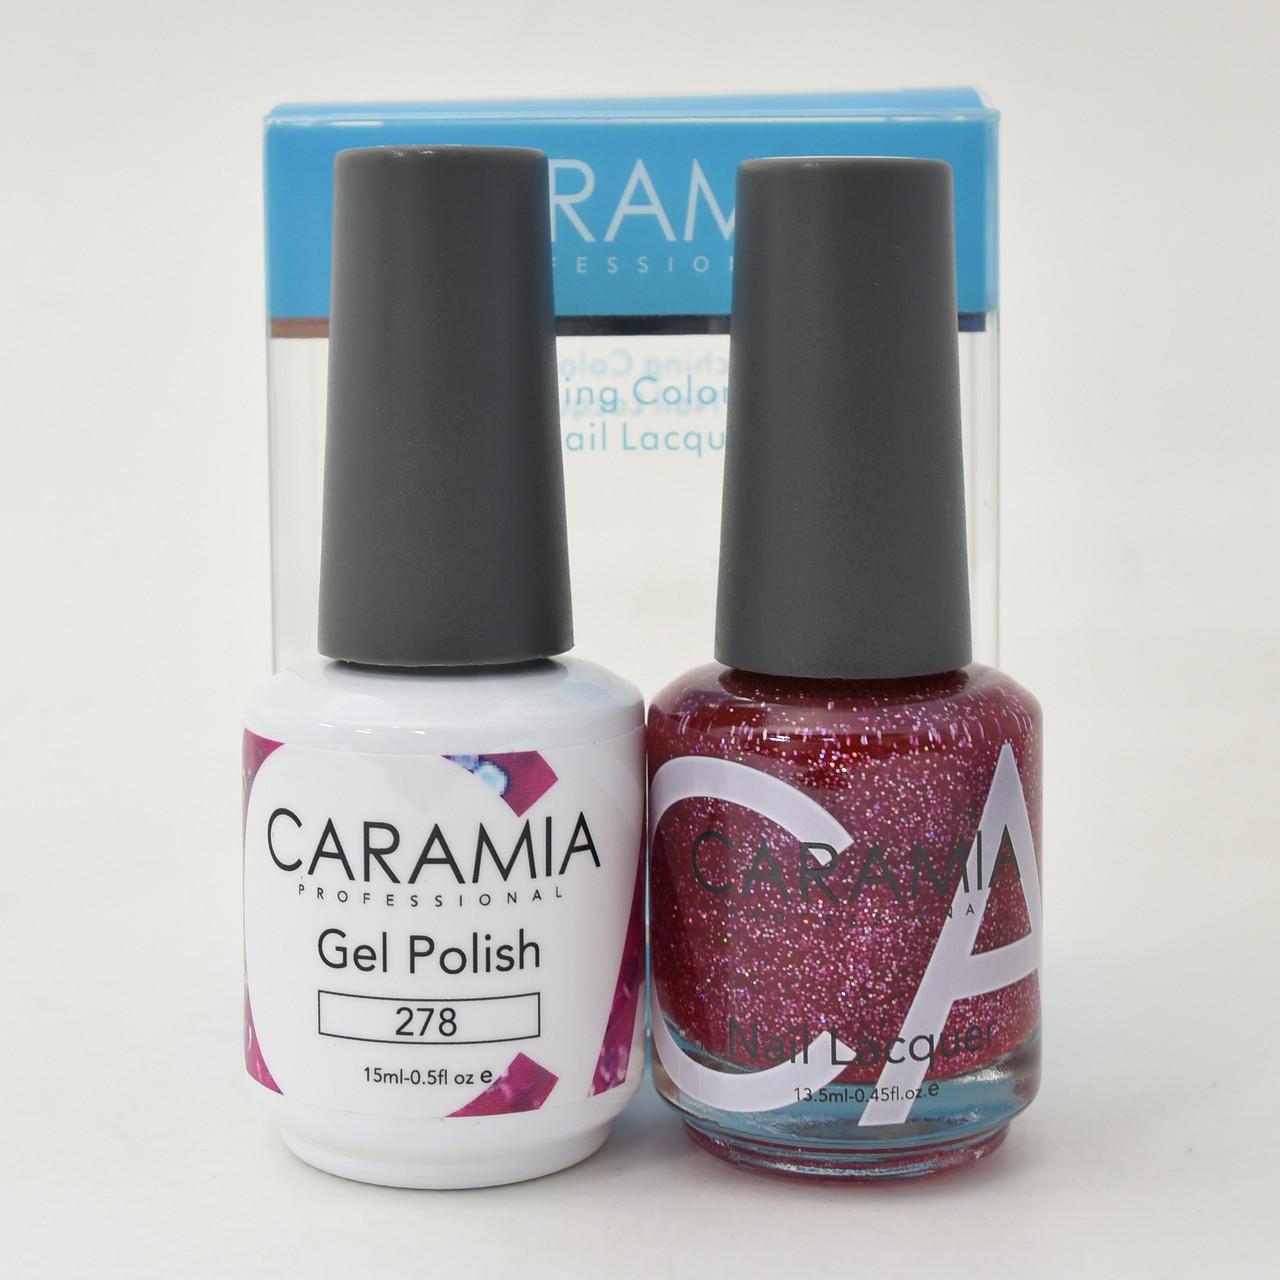 Caramia Gel Polish 15 mL & Nail Lacquer 13.5 mL Color 278 - Home ...